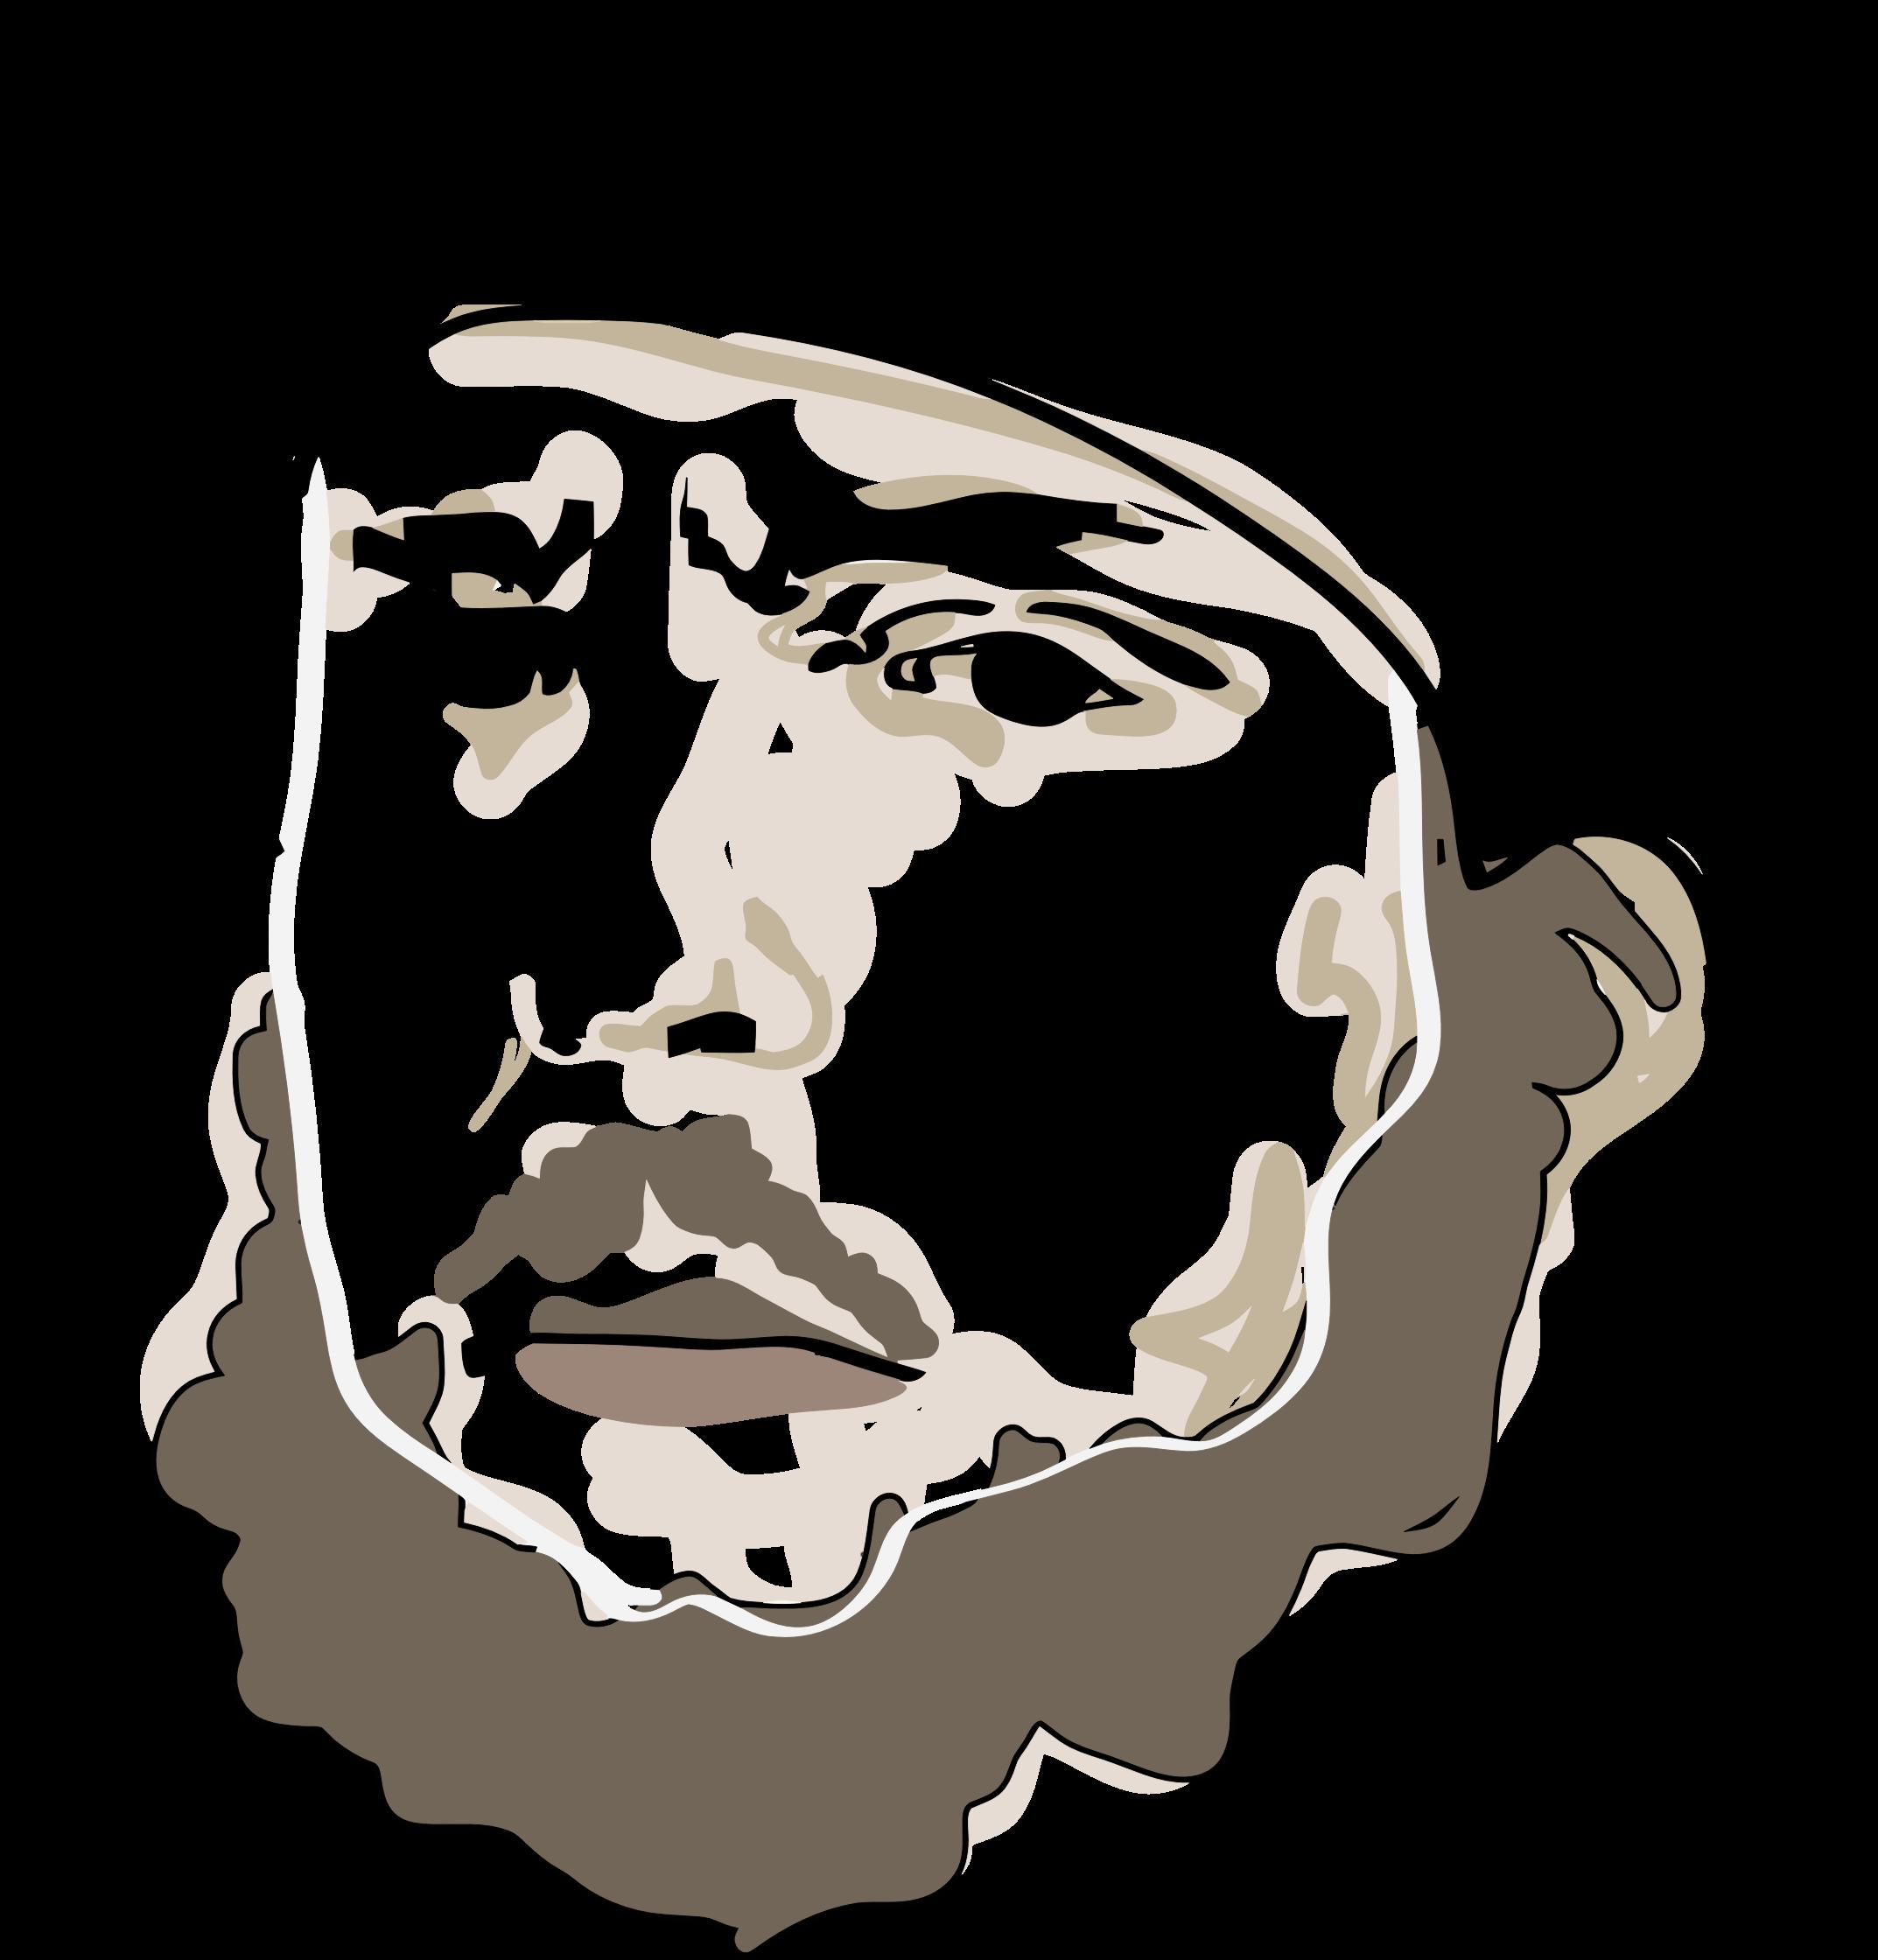 clip transparent library Beard clipart man portrait. Bearded big image png